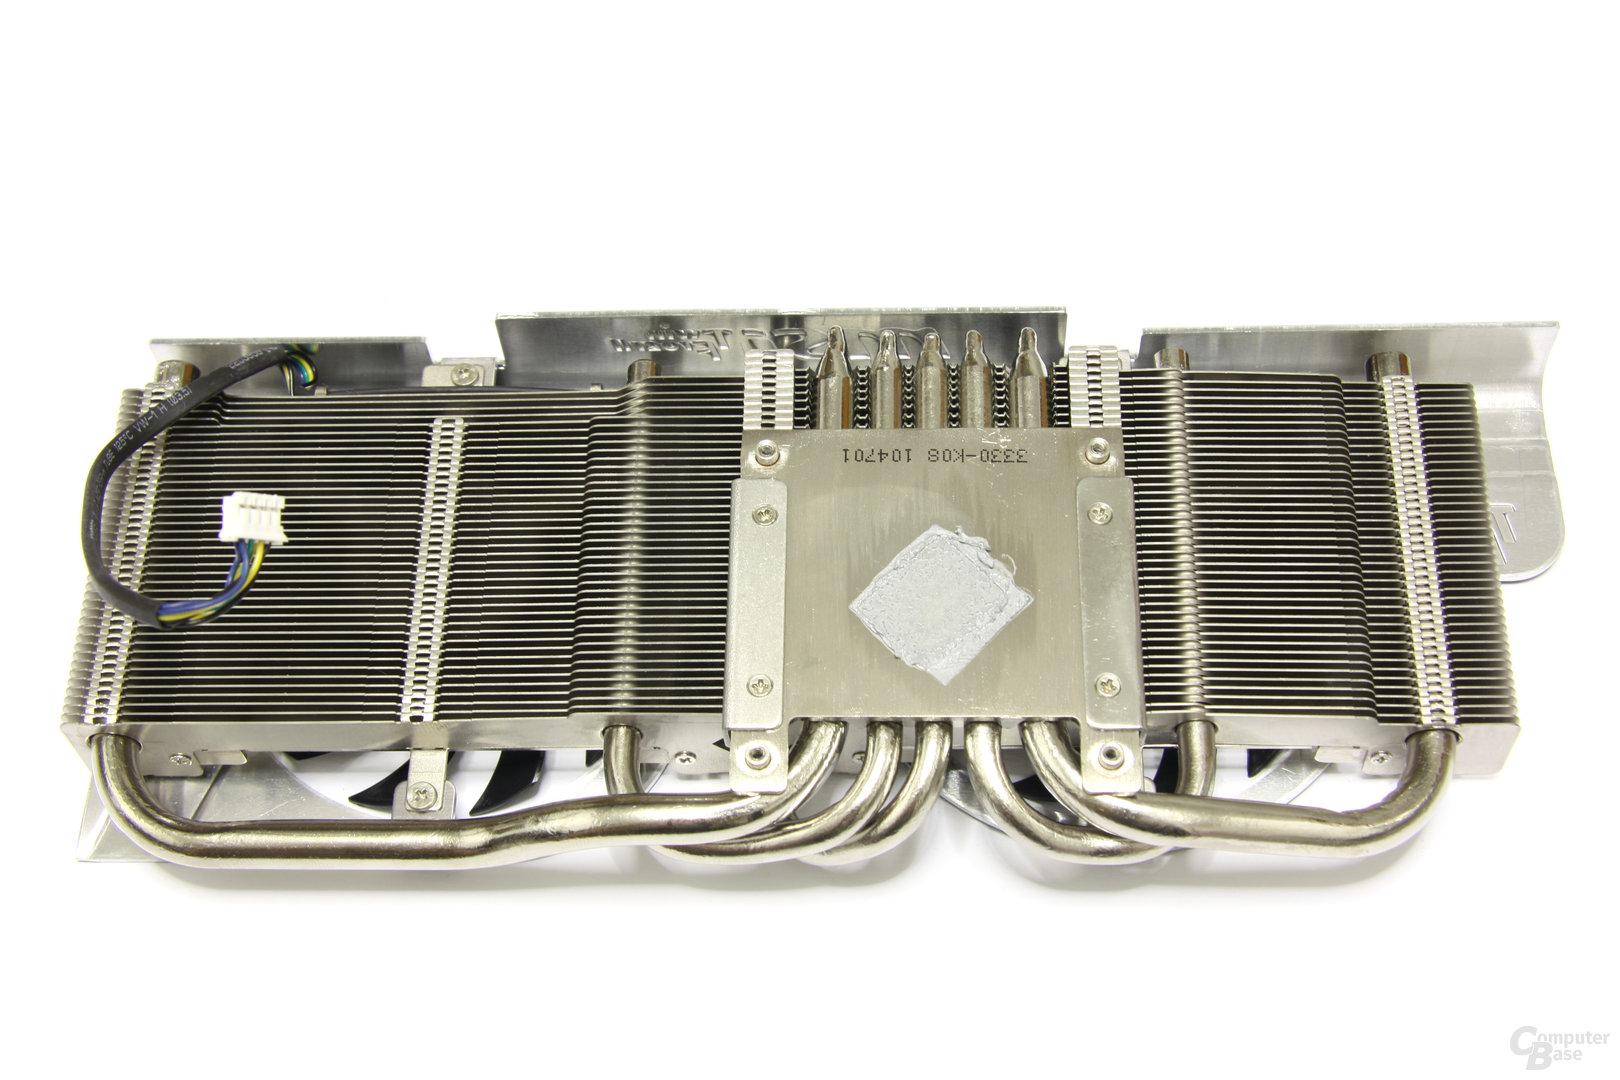 Radeon HD 6870 Twin Frozr II Kühlerrückseite